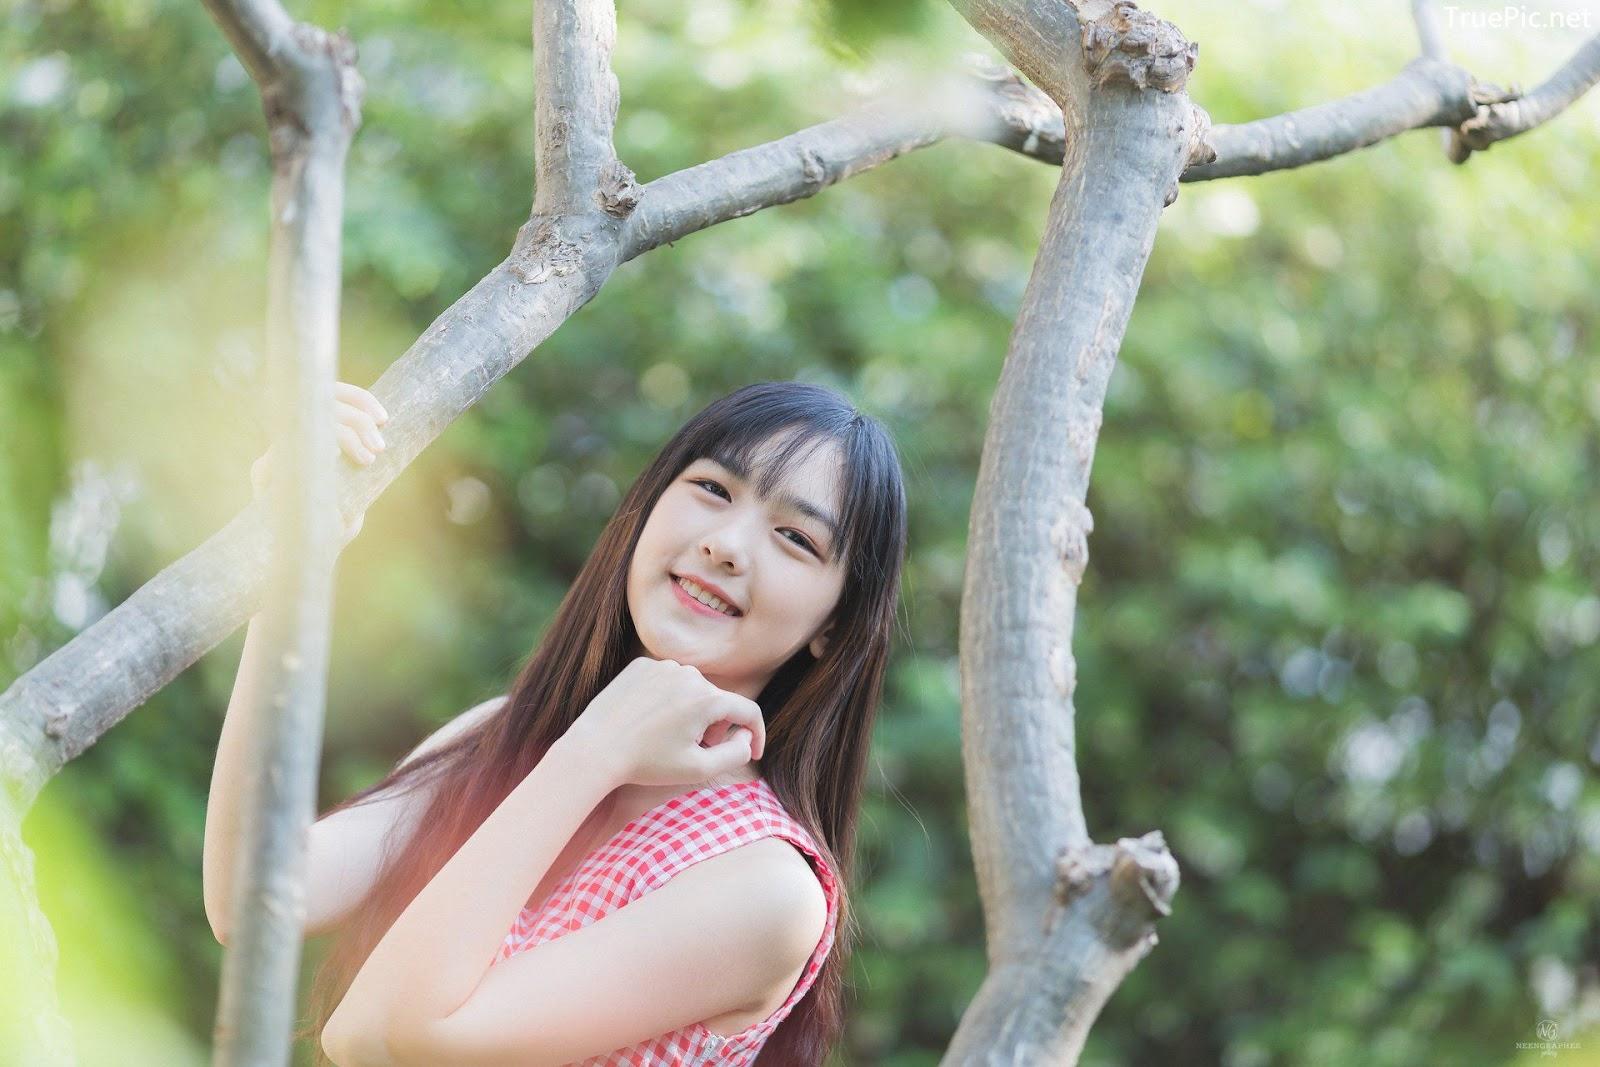 Image-Thailand-Cute-Model-Emma-Panisara–Album-Emma-Bright-Sunday-TruePic.net- Picture-21